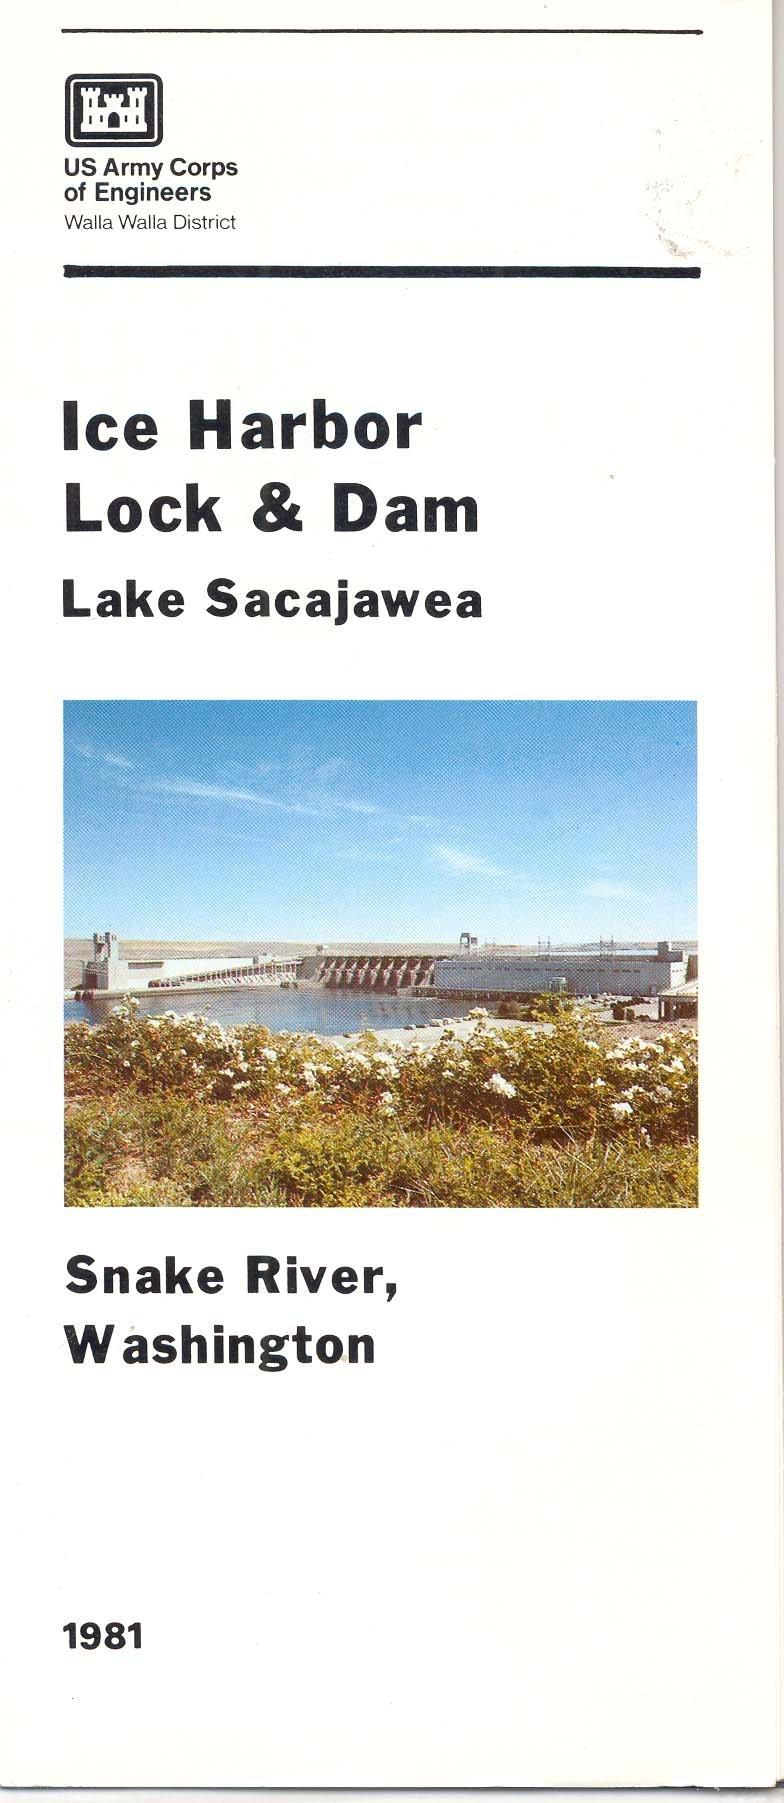 Snake River Washington Map.Ice Harbor Lock And Dam Lake Sacajawea Snake River Washington Us